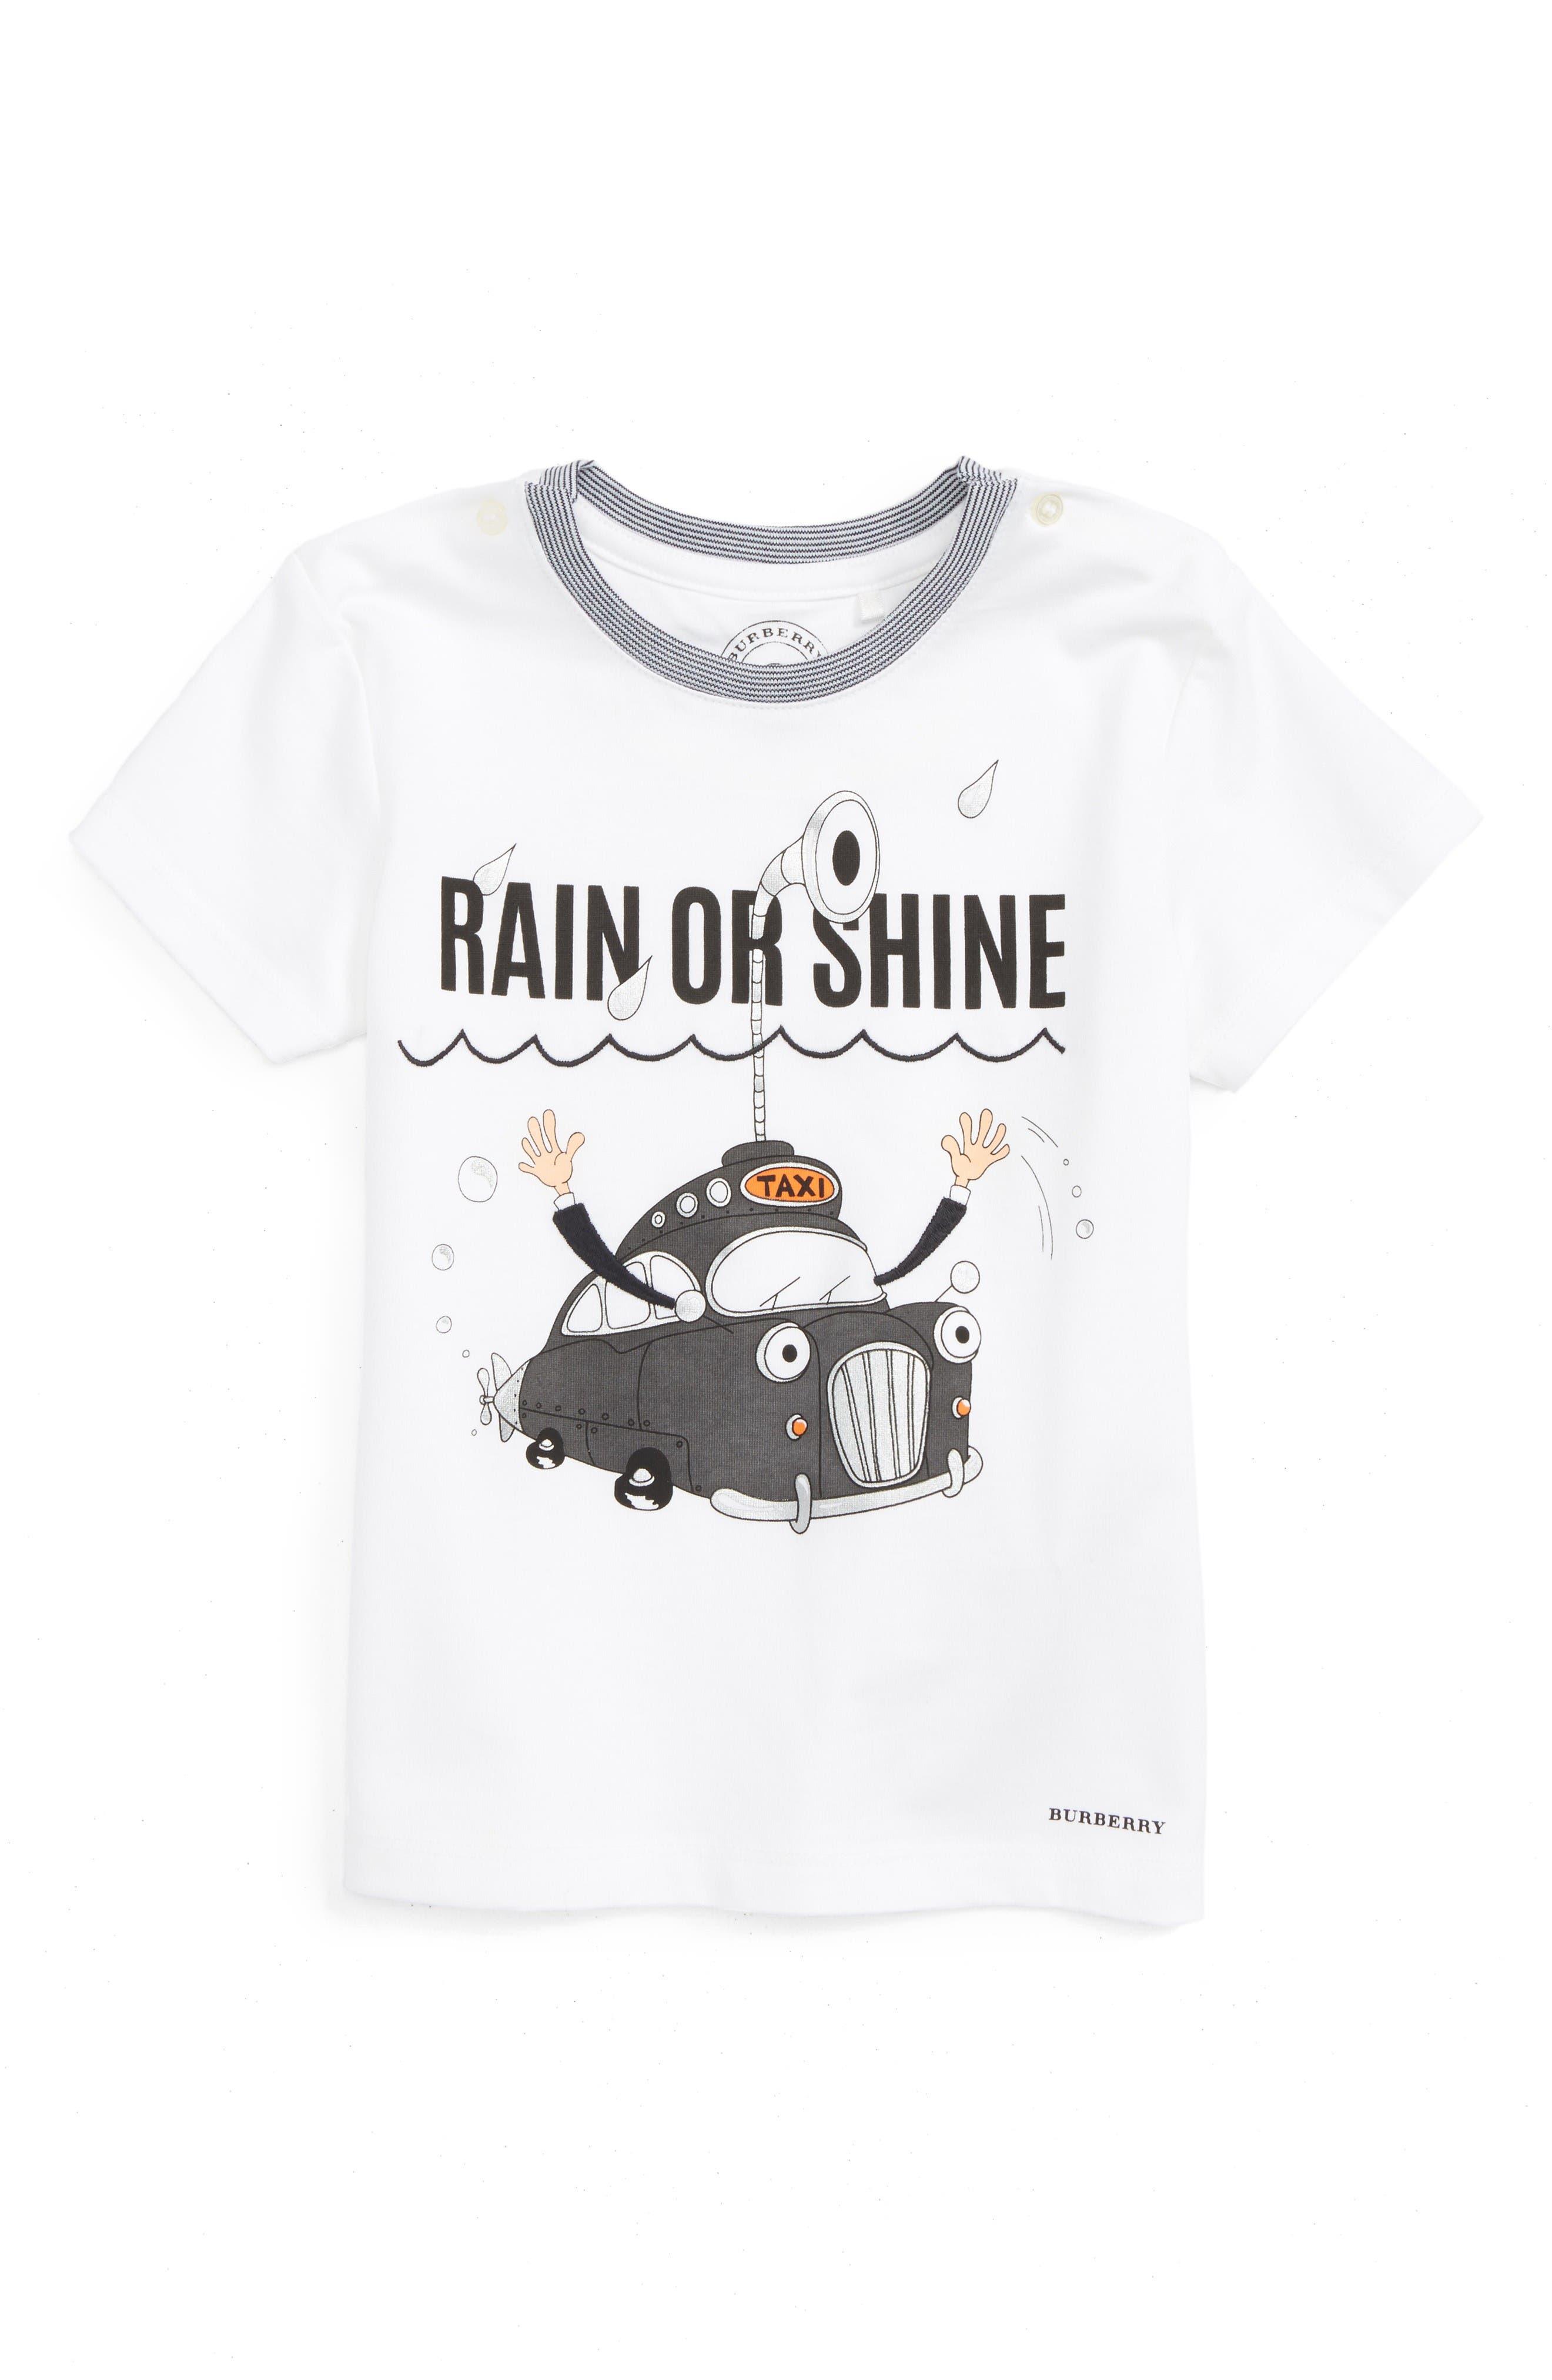 Burberry Rain Or Shine Graphic Shirt (Baby Boys & Toddler Boys)